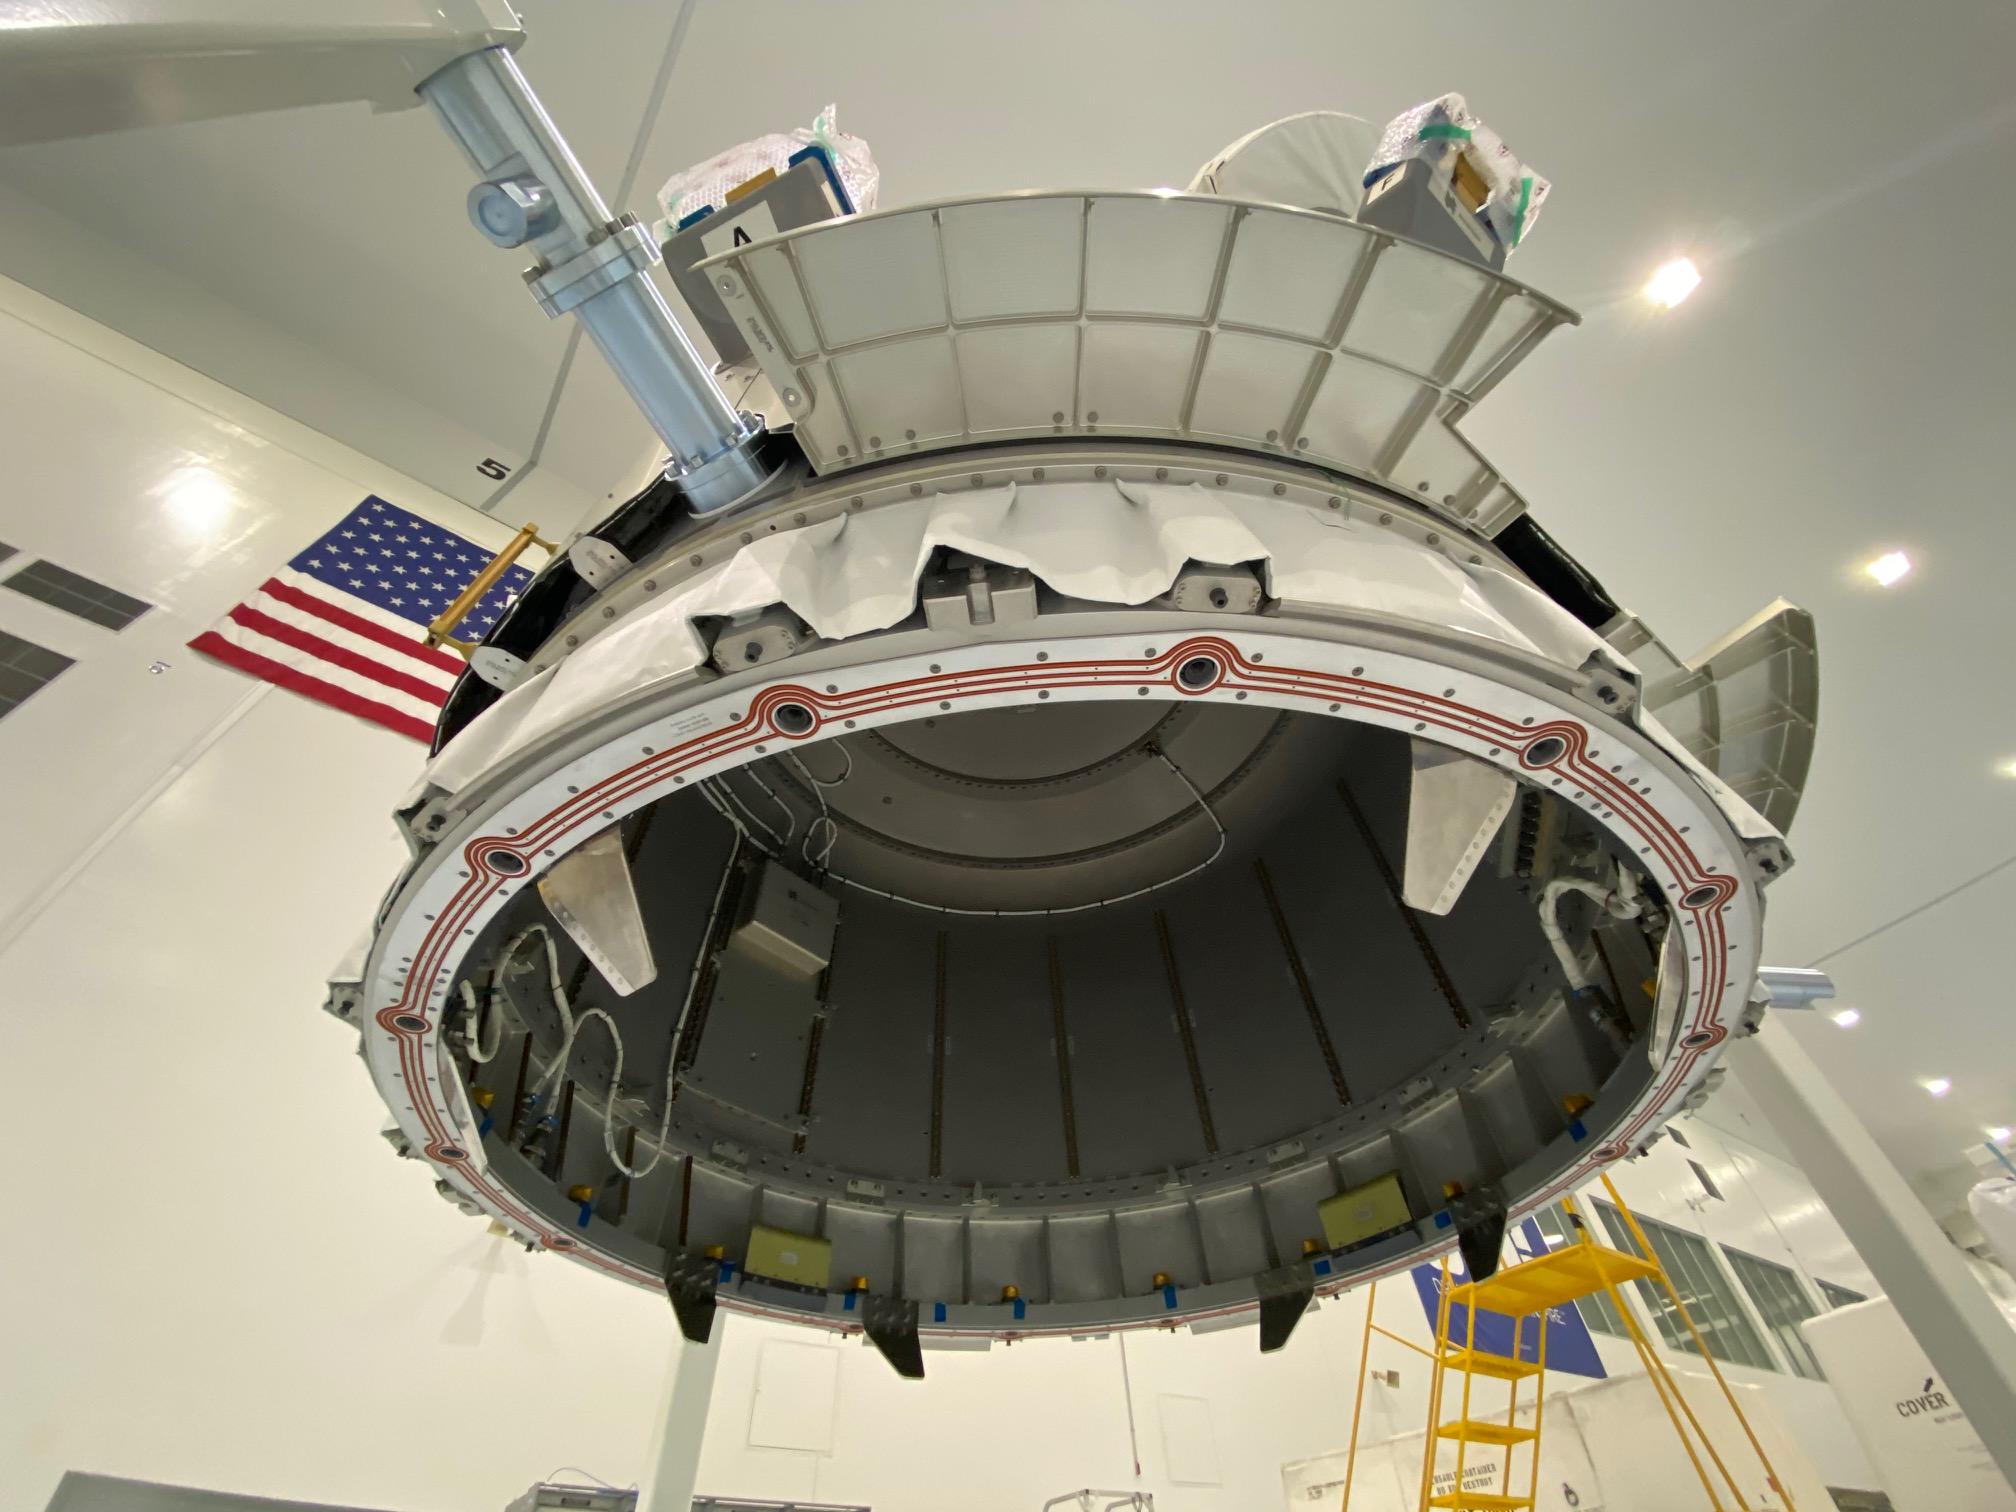 Nanoracks : installation du sas commercial Bishop sur l'ISS 3197